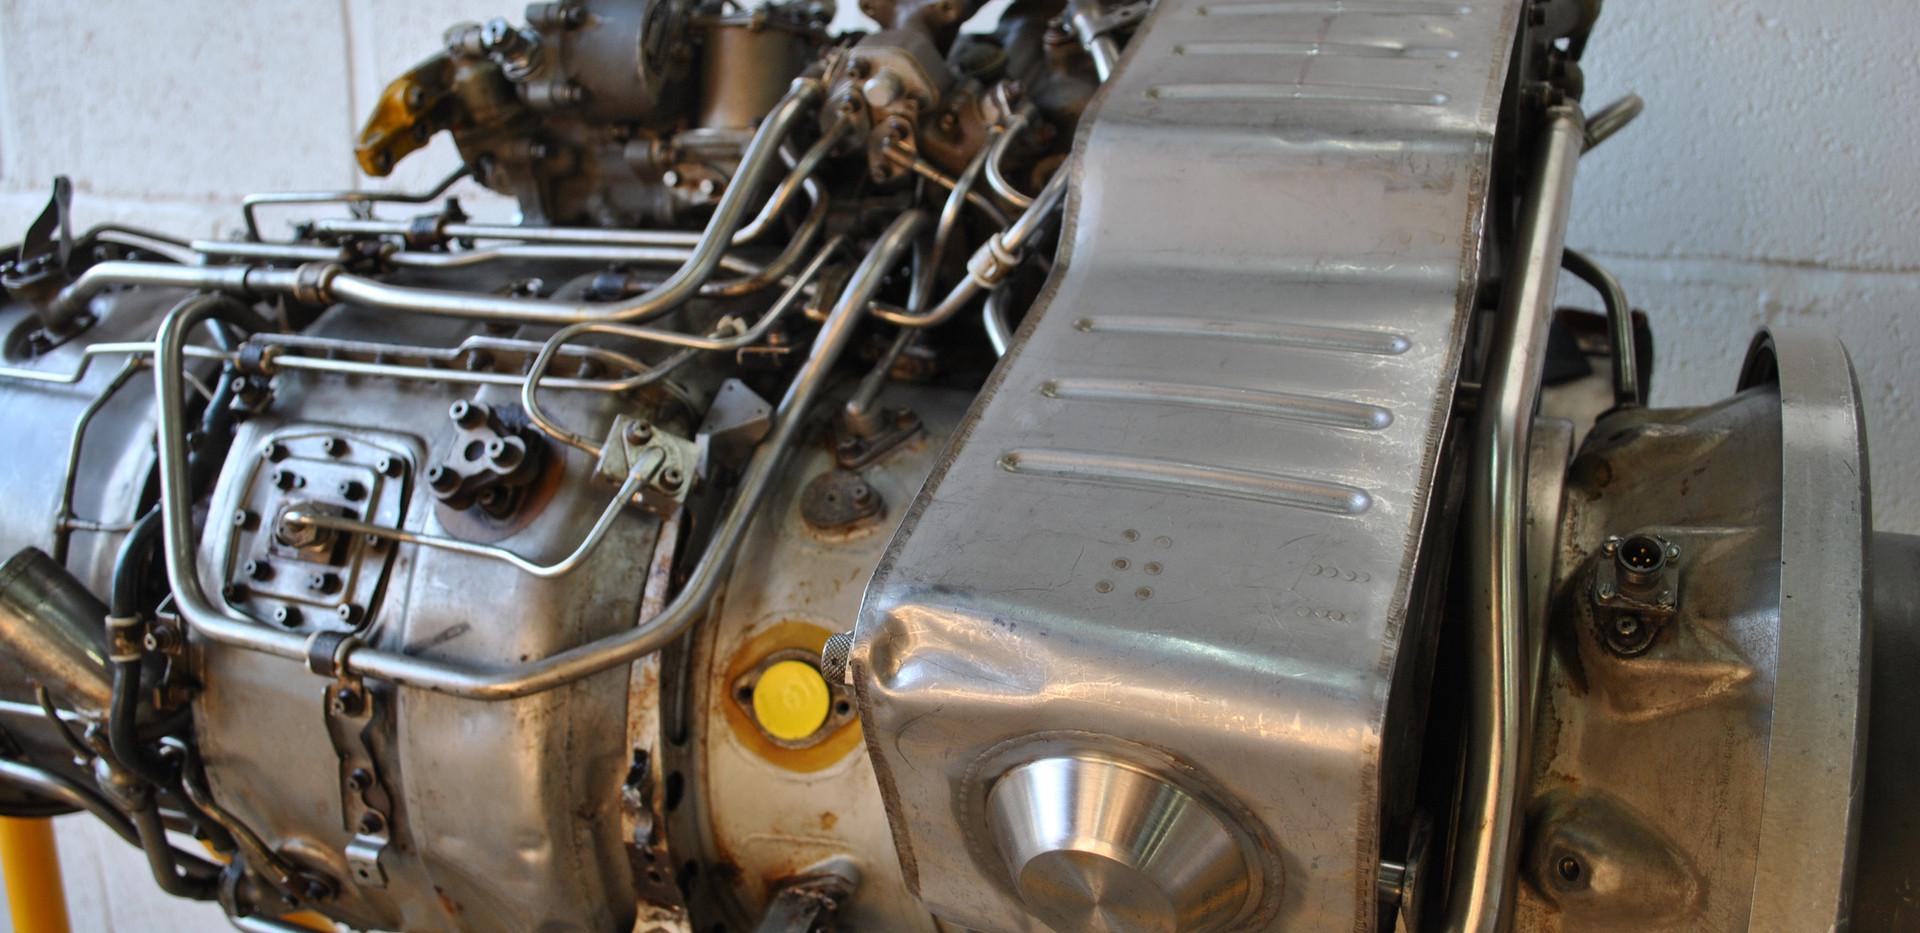 Rolls Royce Gem Engine in Stand (36).JPG